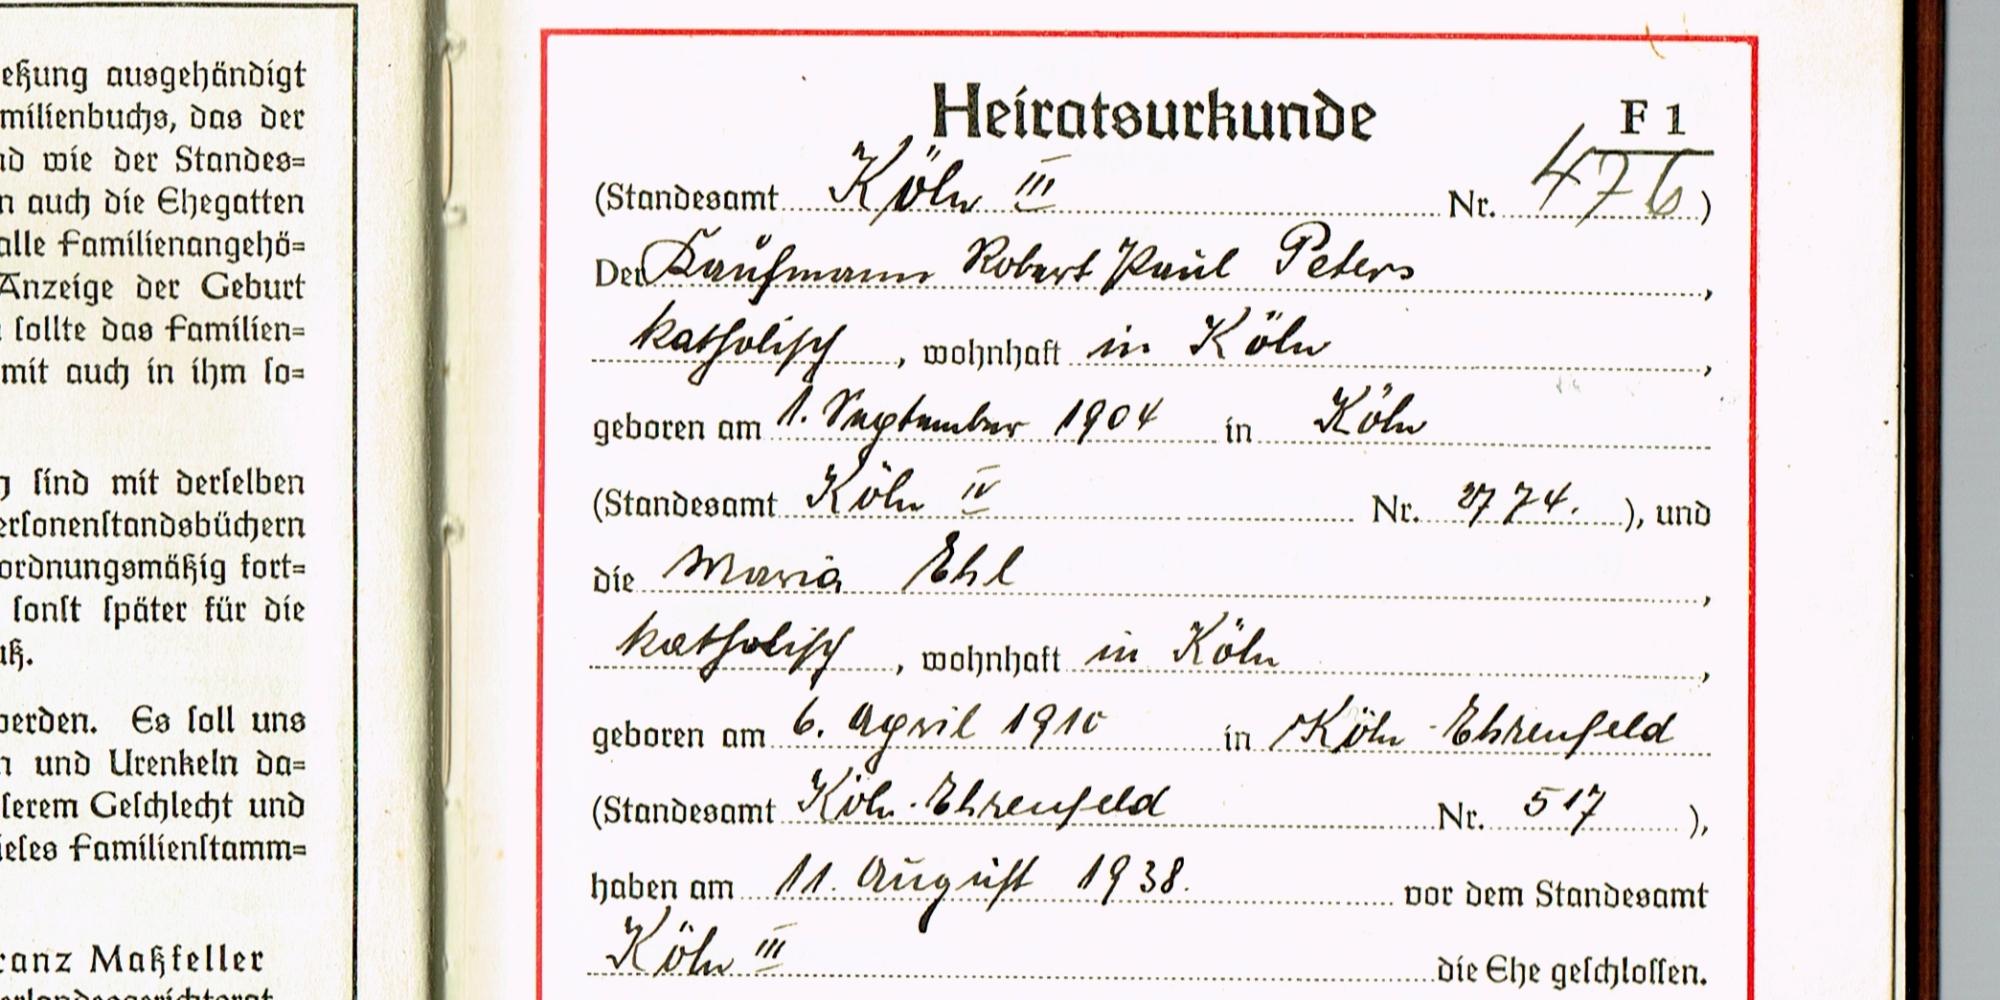 Ahnenforschung Peters Ehl Köln - Peters, Müller, Köln, Ehl, 1938, 1910, 1904